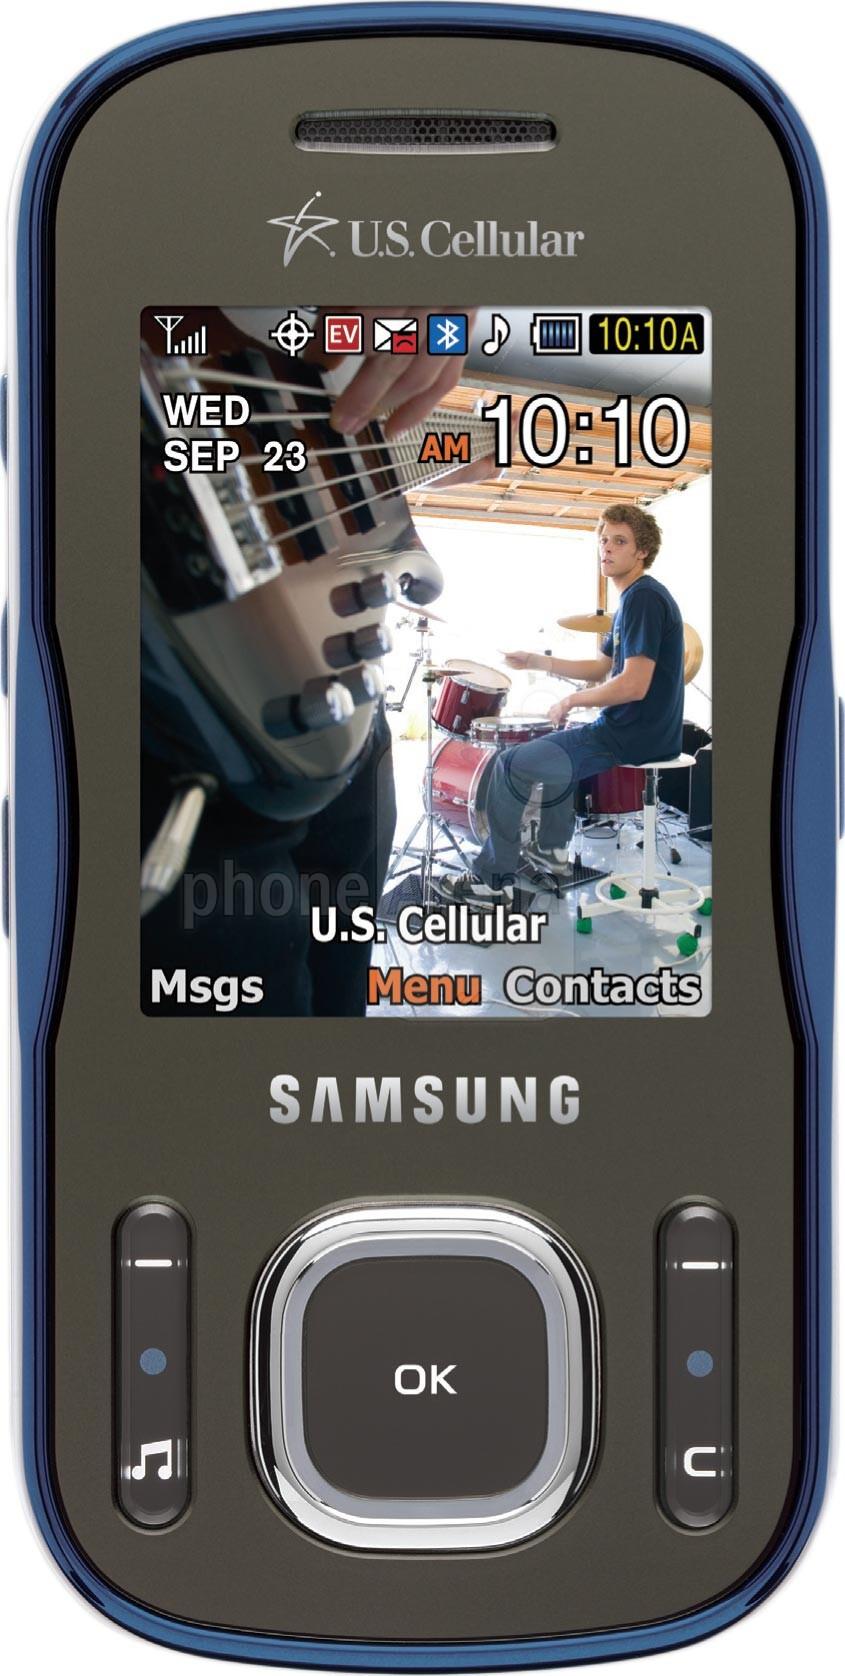 Samsung Trill